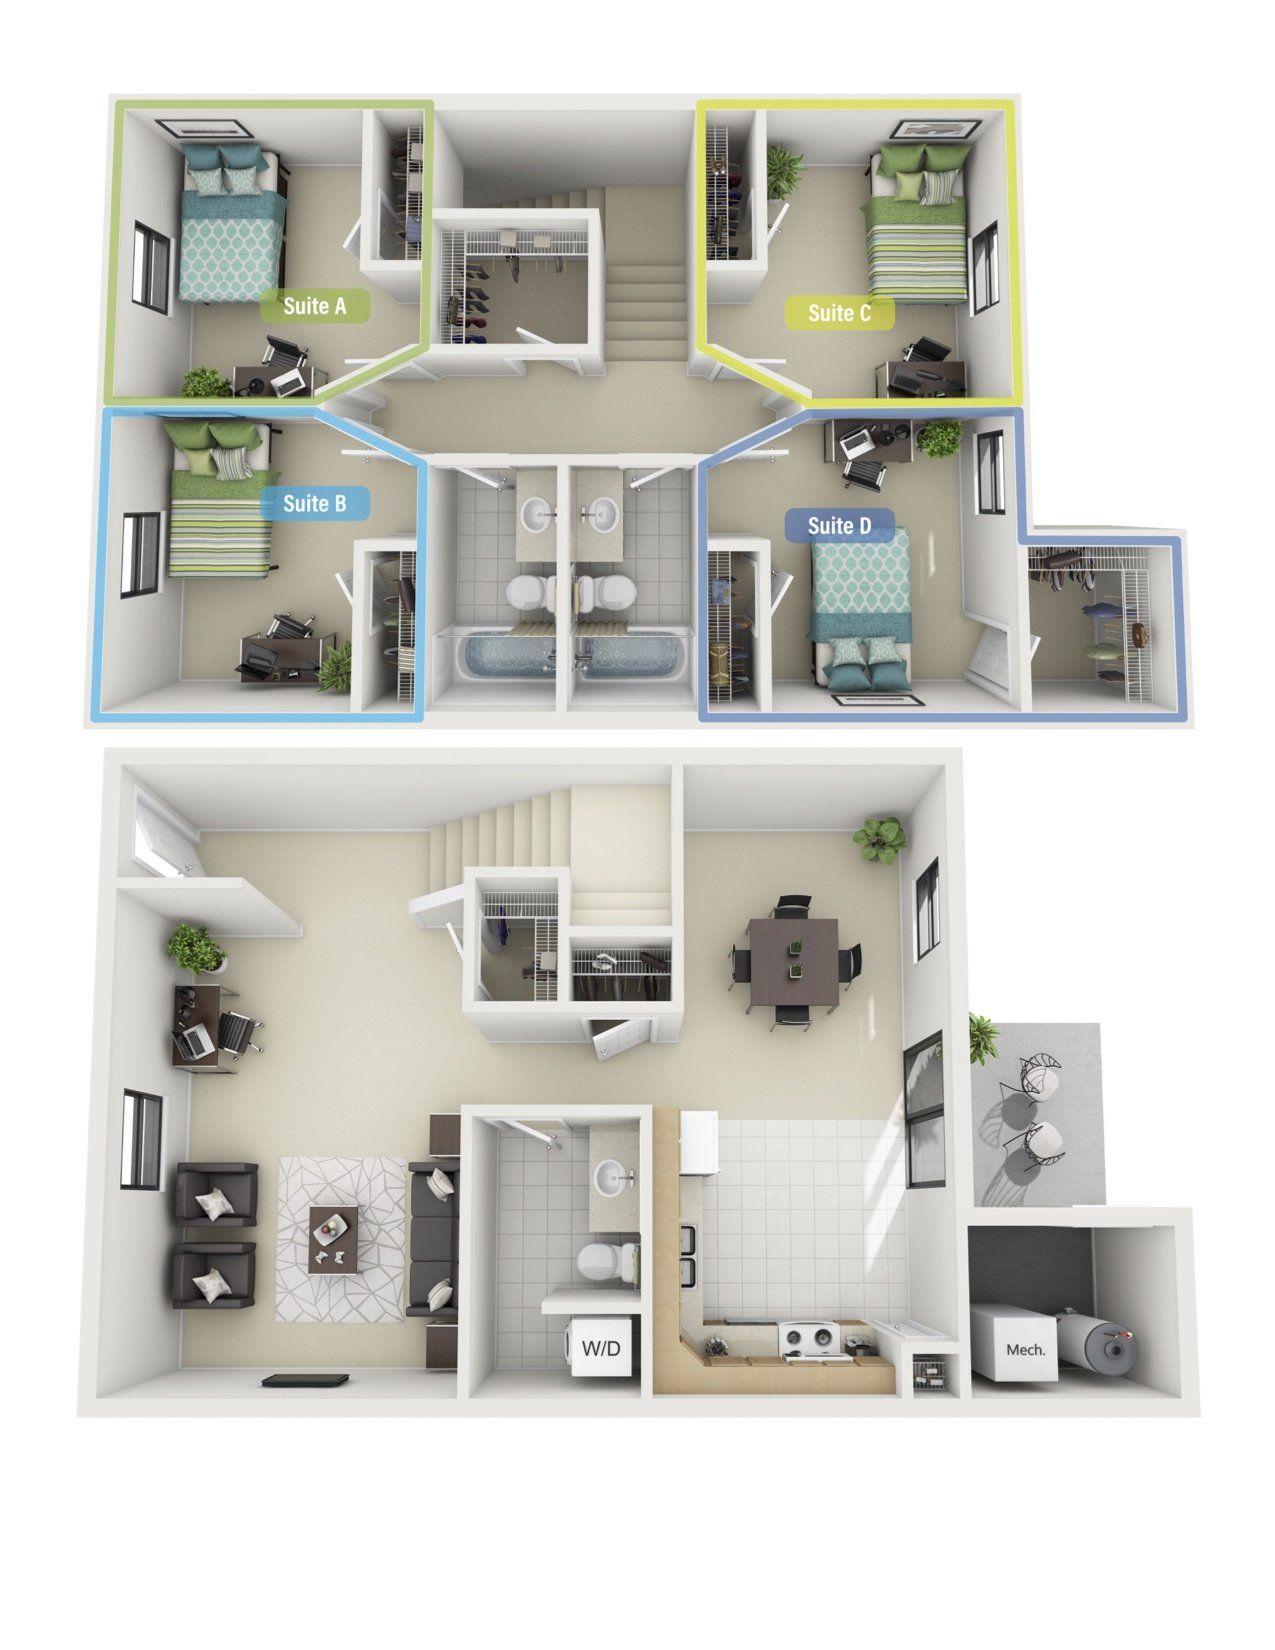 Campus Creek Cottages And Apartments Off Campus Housing Big Rapids Mi Forrentuniversity Com House Plans House Apartment